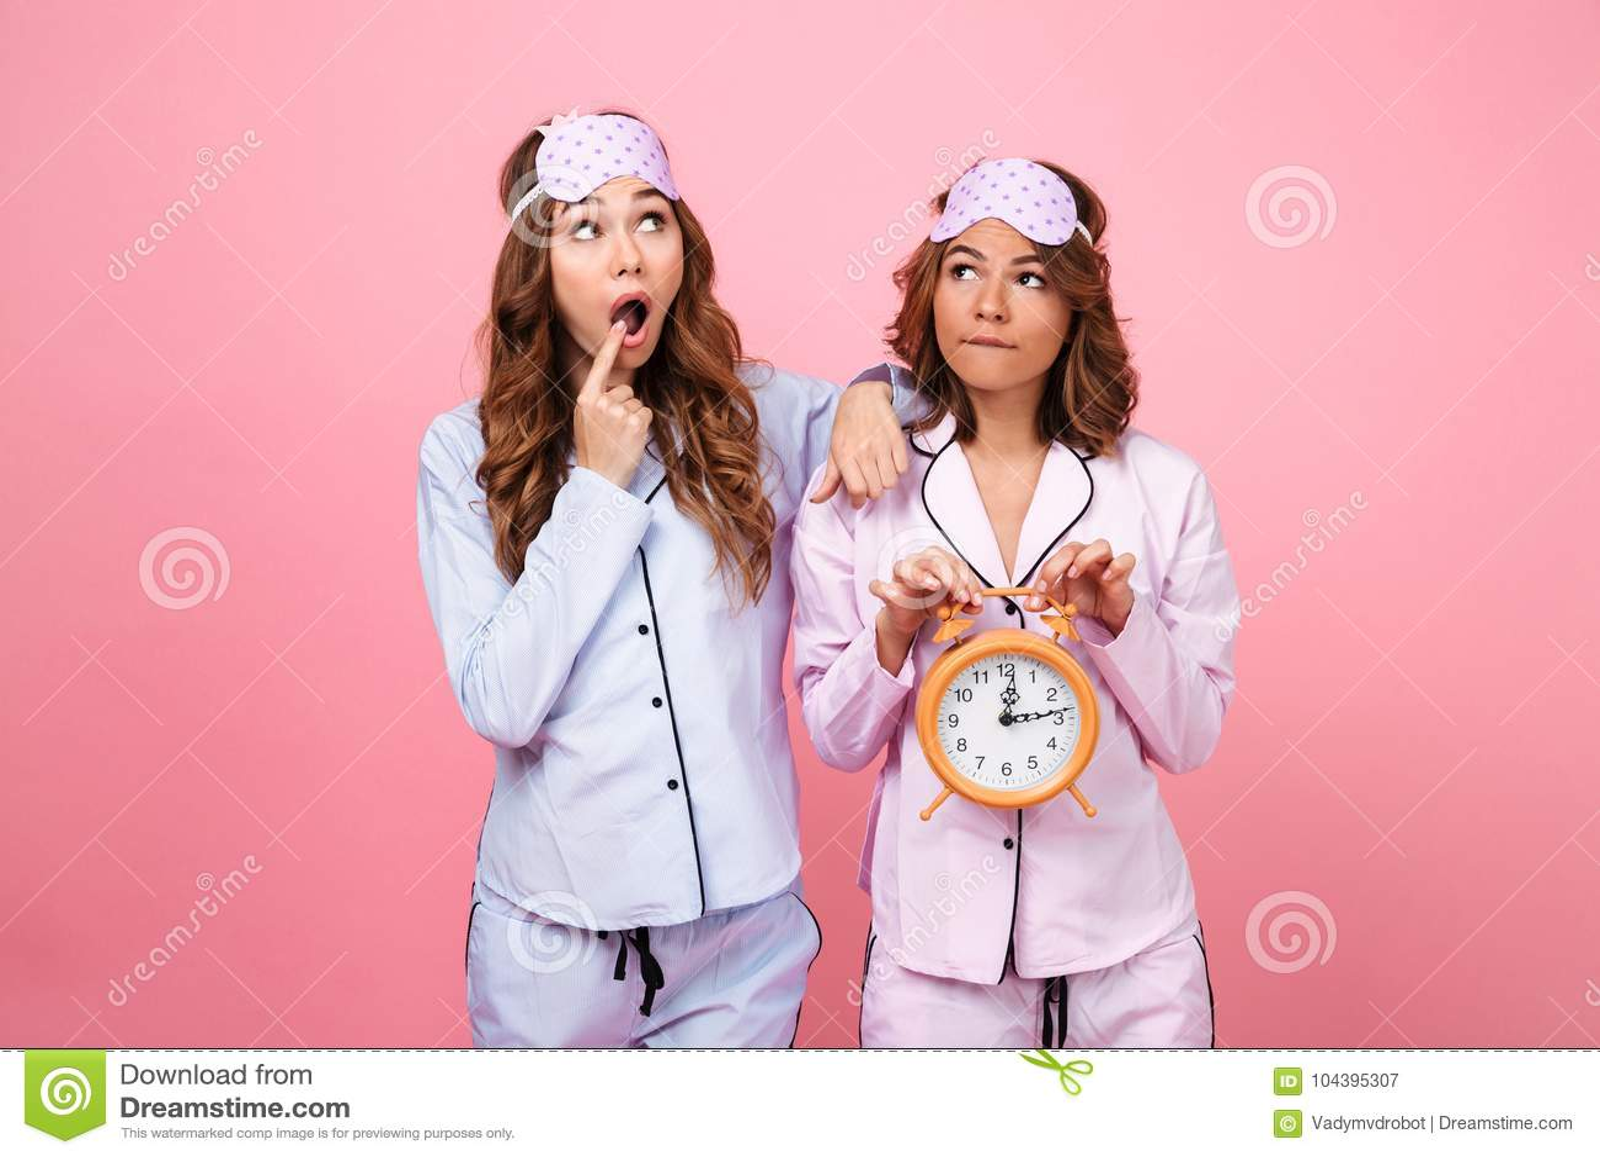 Shocked friends women in pajamas holding alarm clock